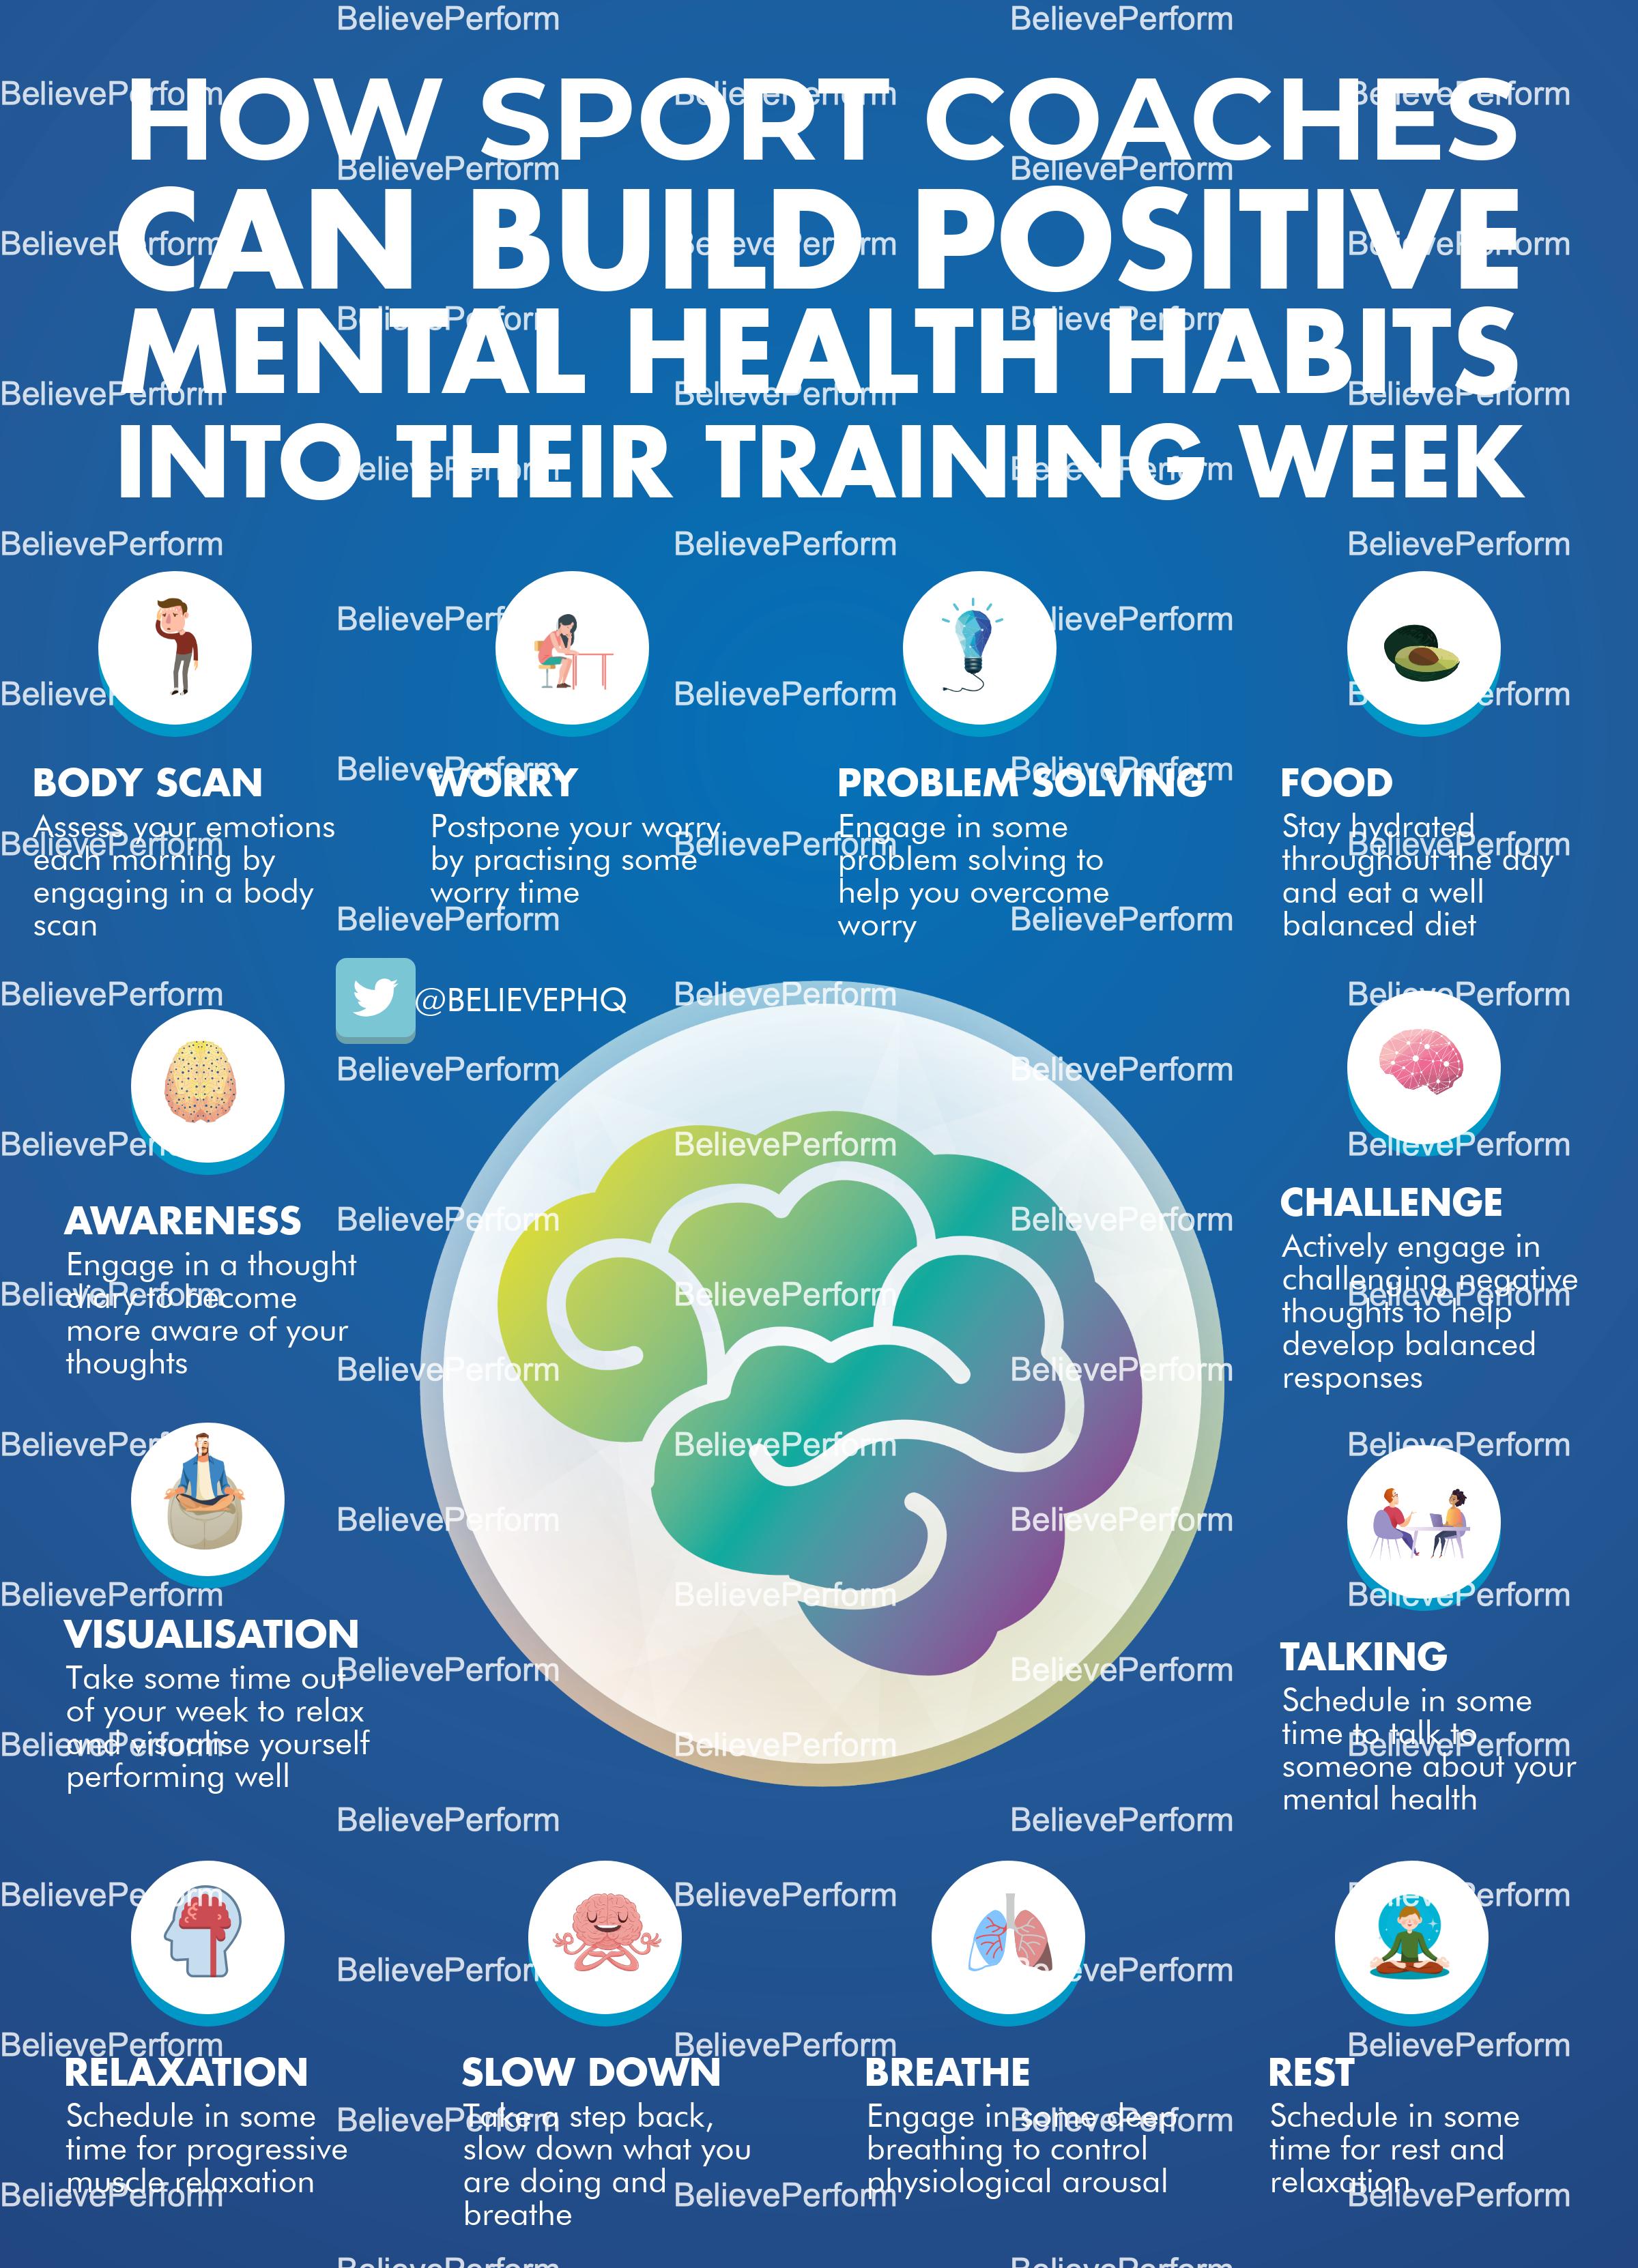 How sport coaches can build positive mental health habits ...